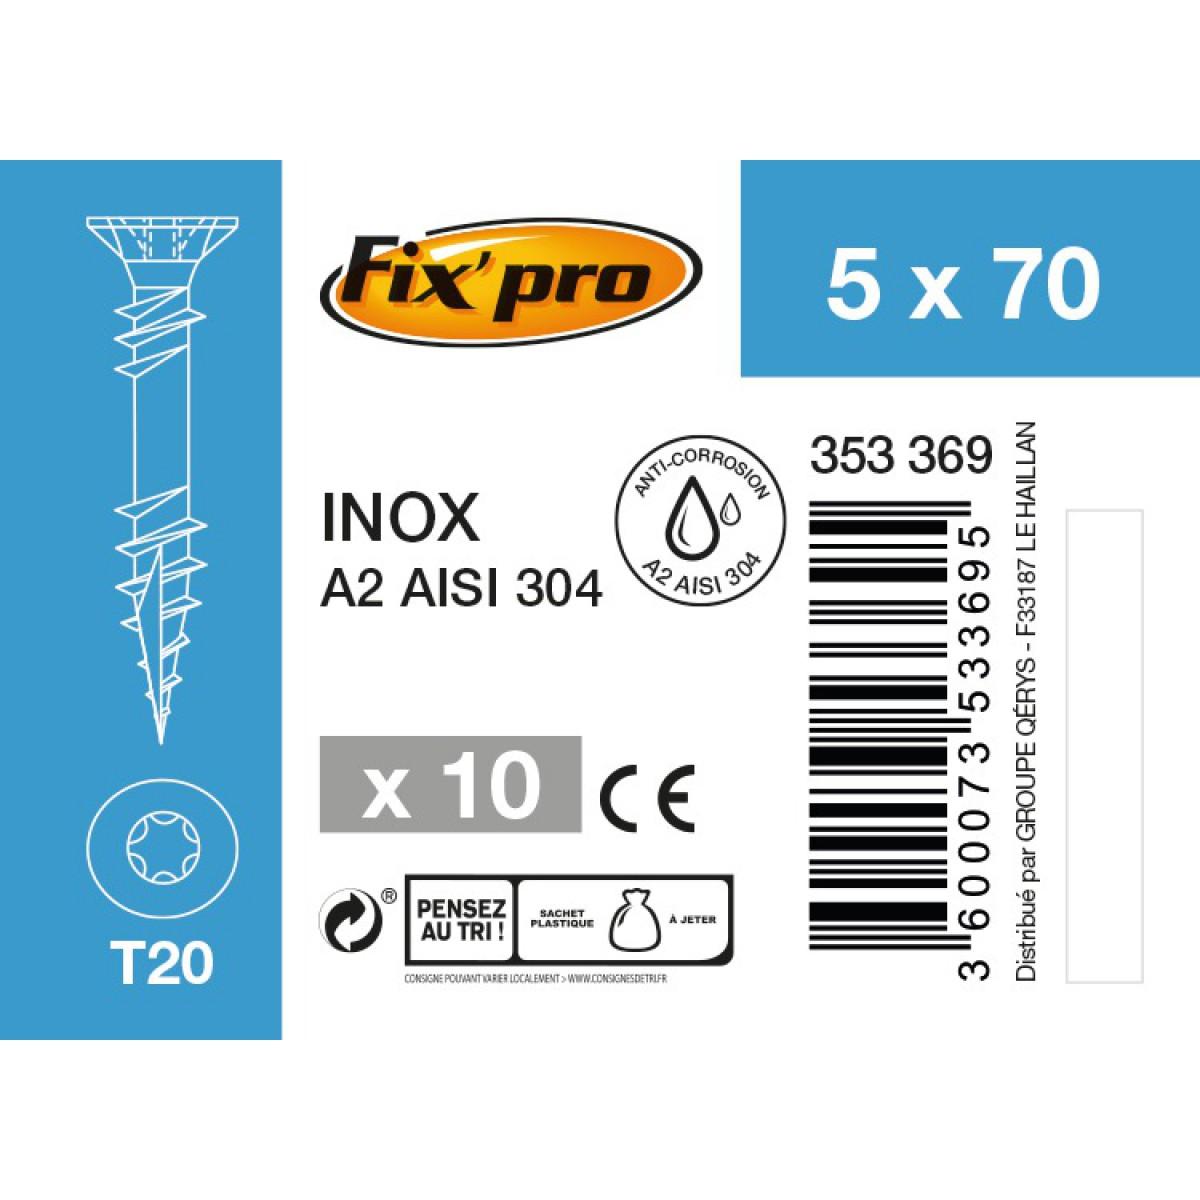 Vis terrasse inox A2 - 5x70 - 10pces - Fixpro